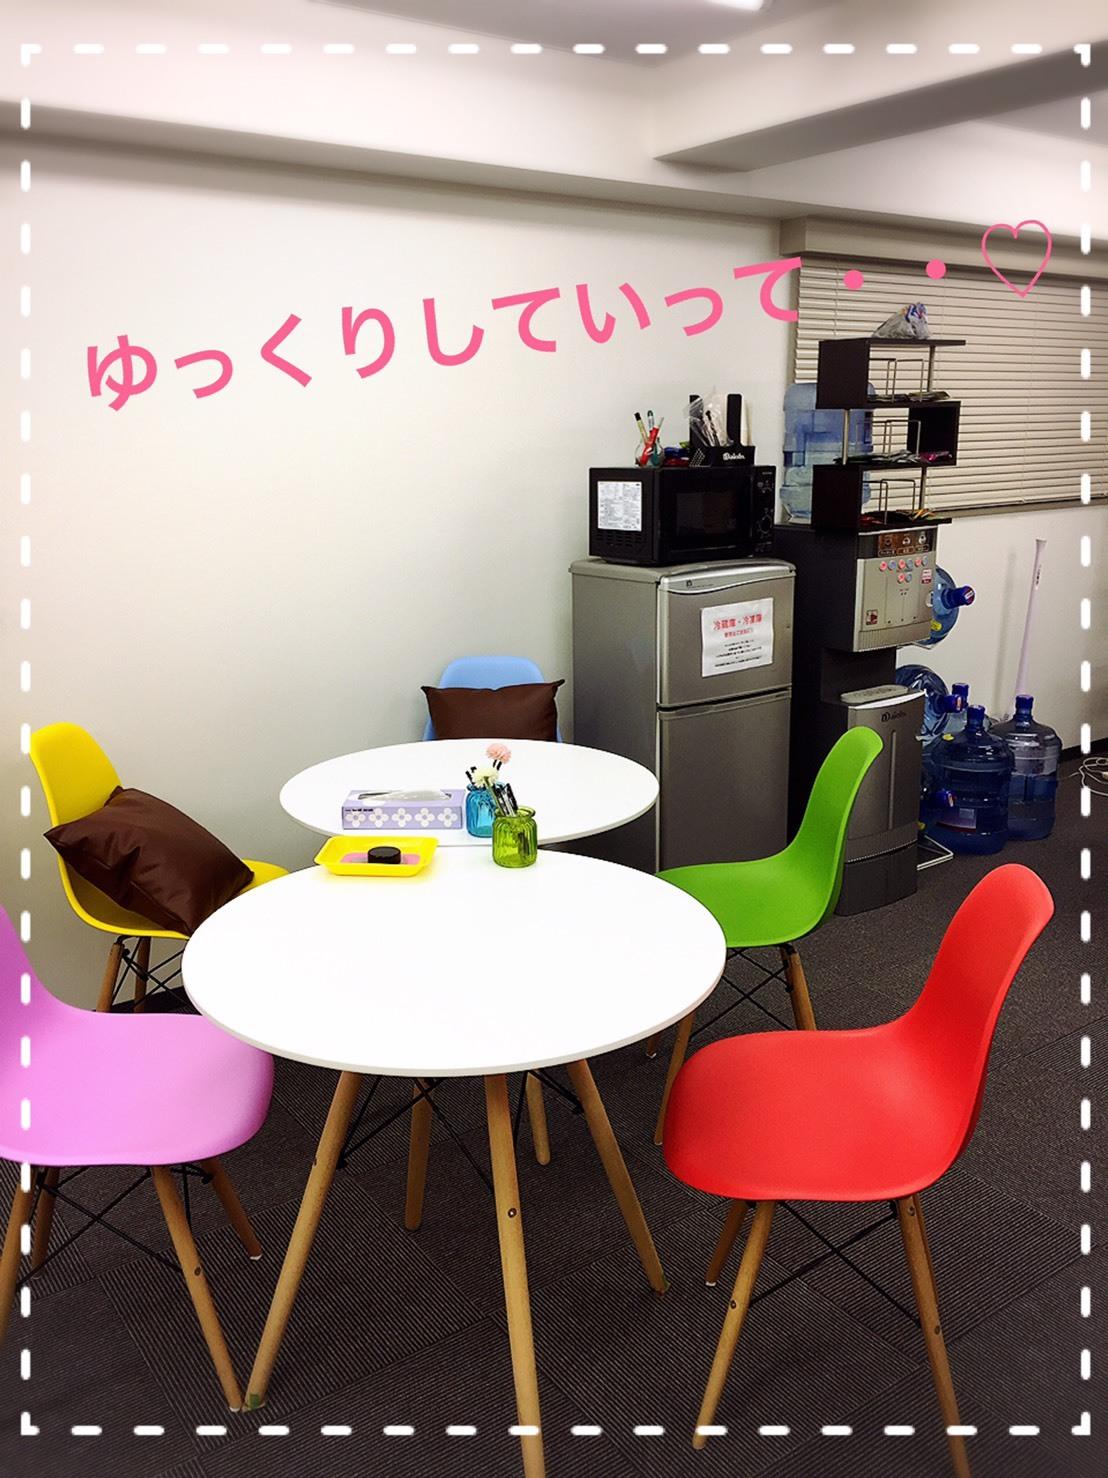 S__3645449.jpg